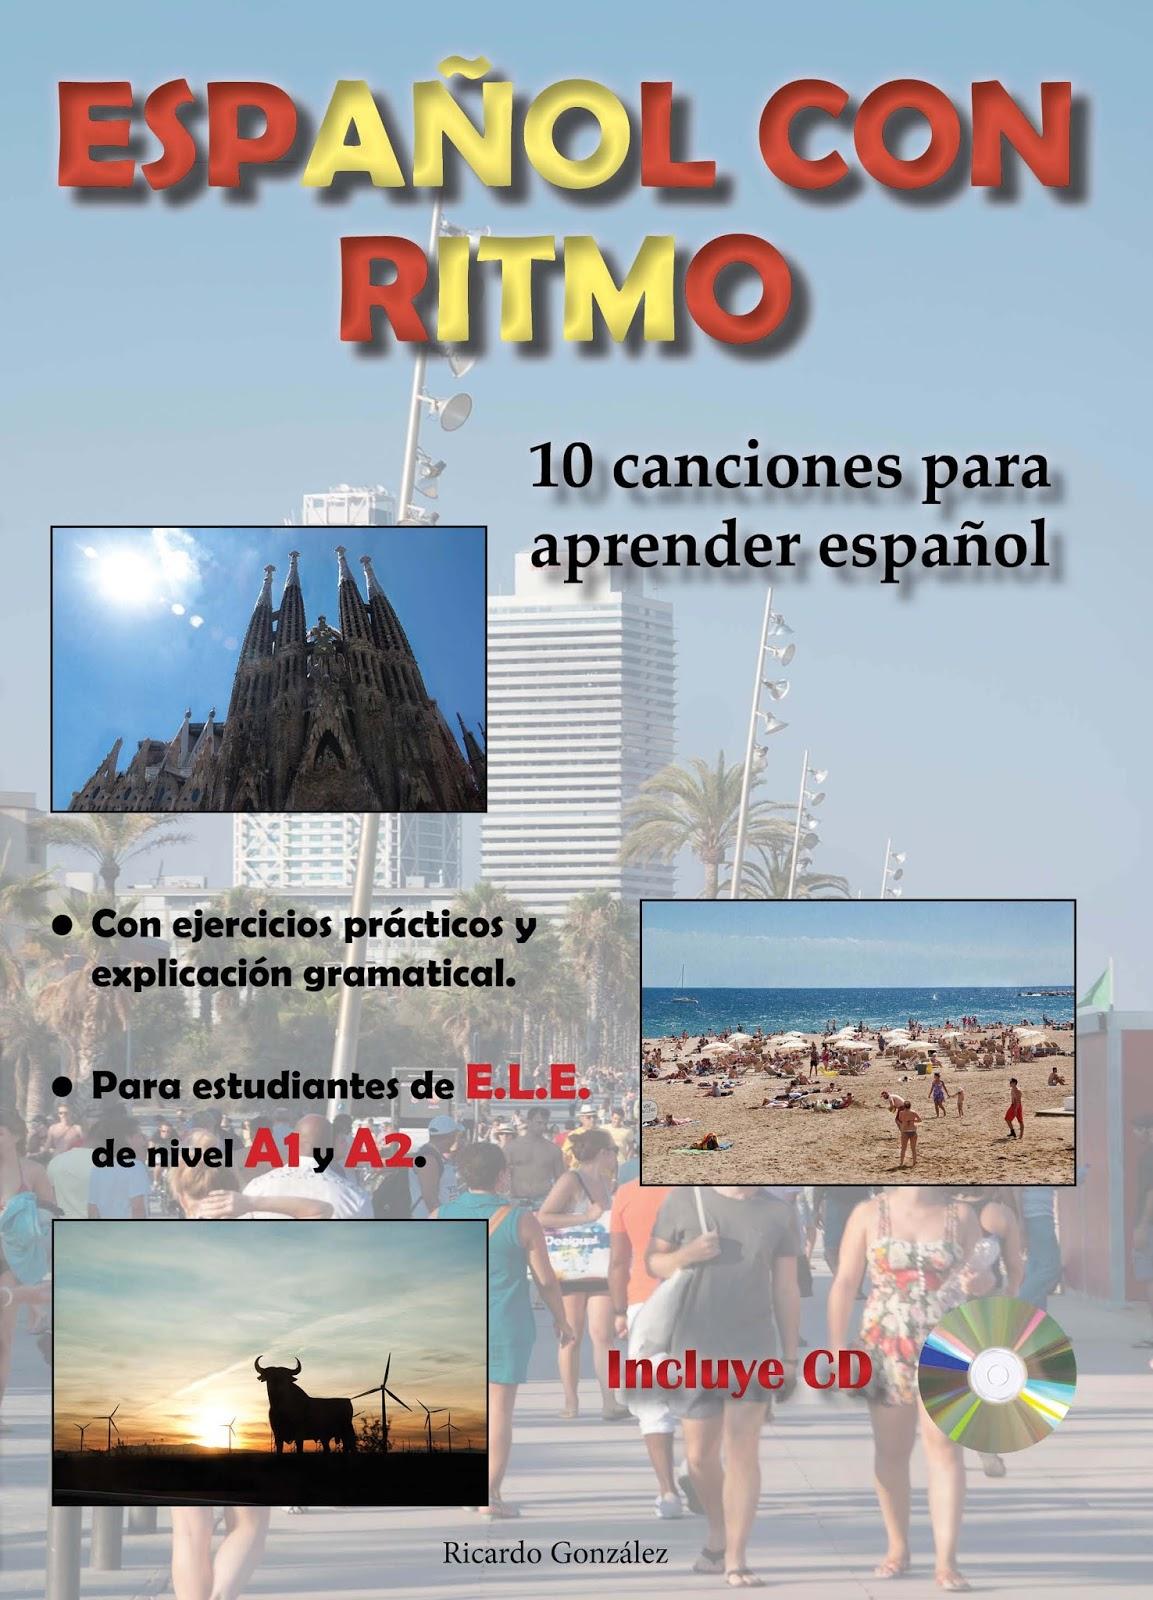 """Español con ritmo"" songbook by Ricardo González. Visit www.soeasyspanish.com  #español #spanish #learnspanish"